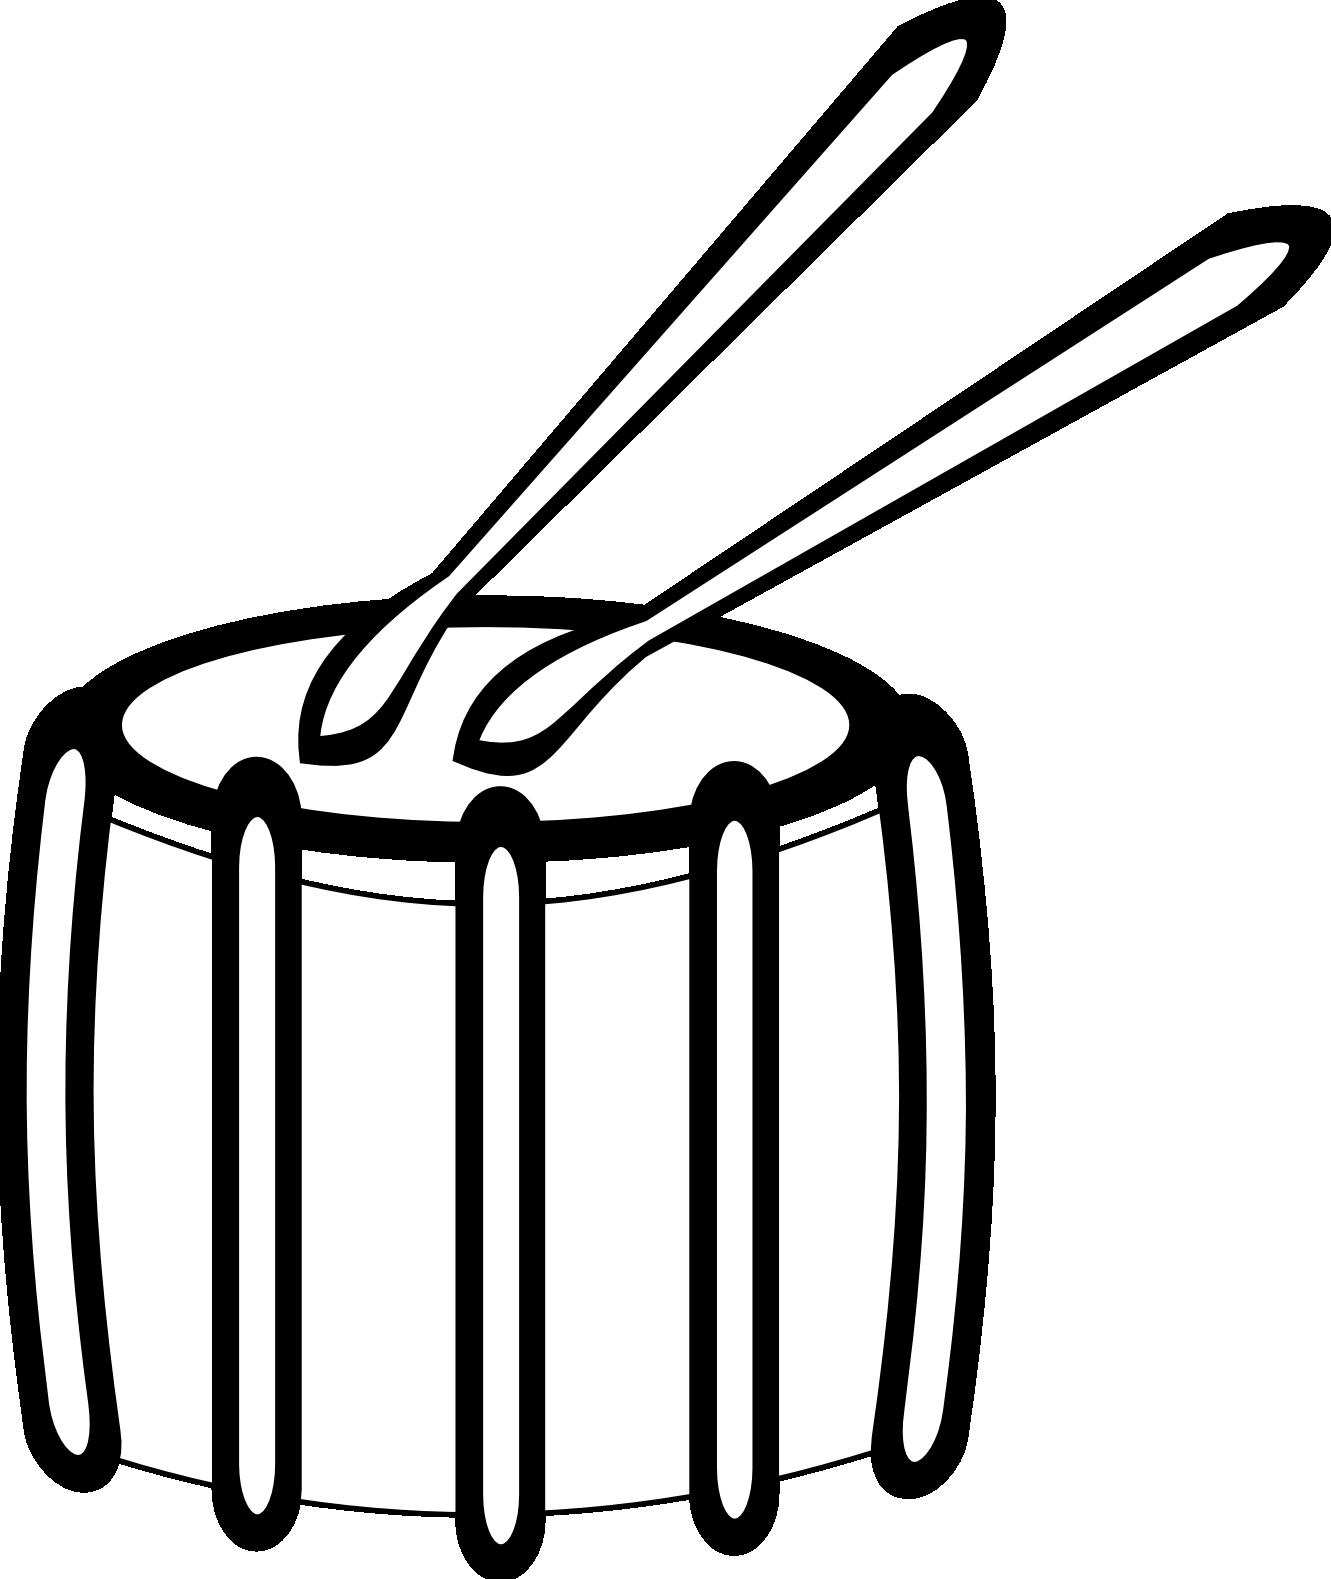 graphic download Drum clip art panda. Snare clipart